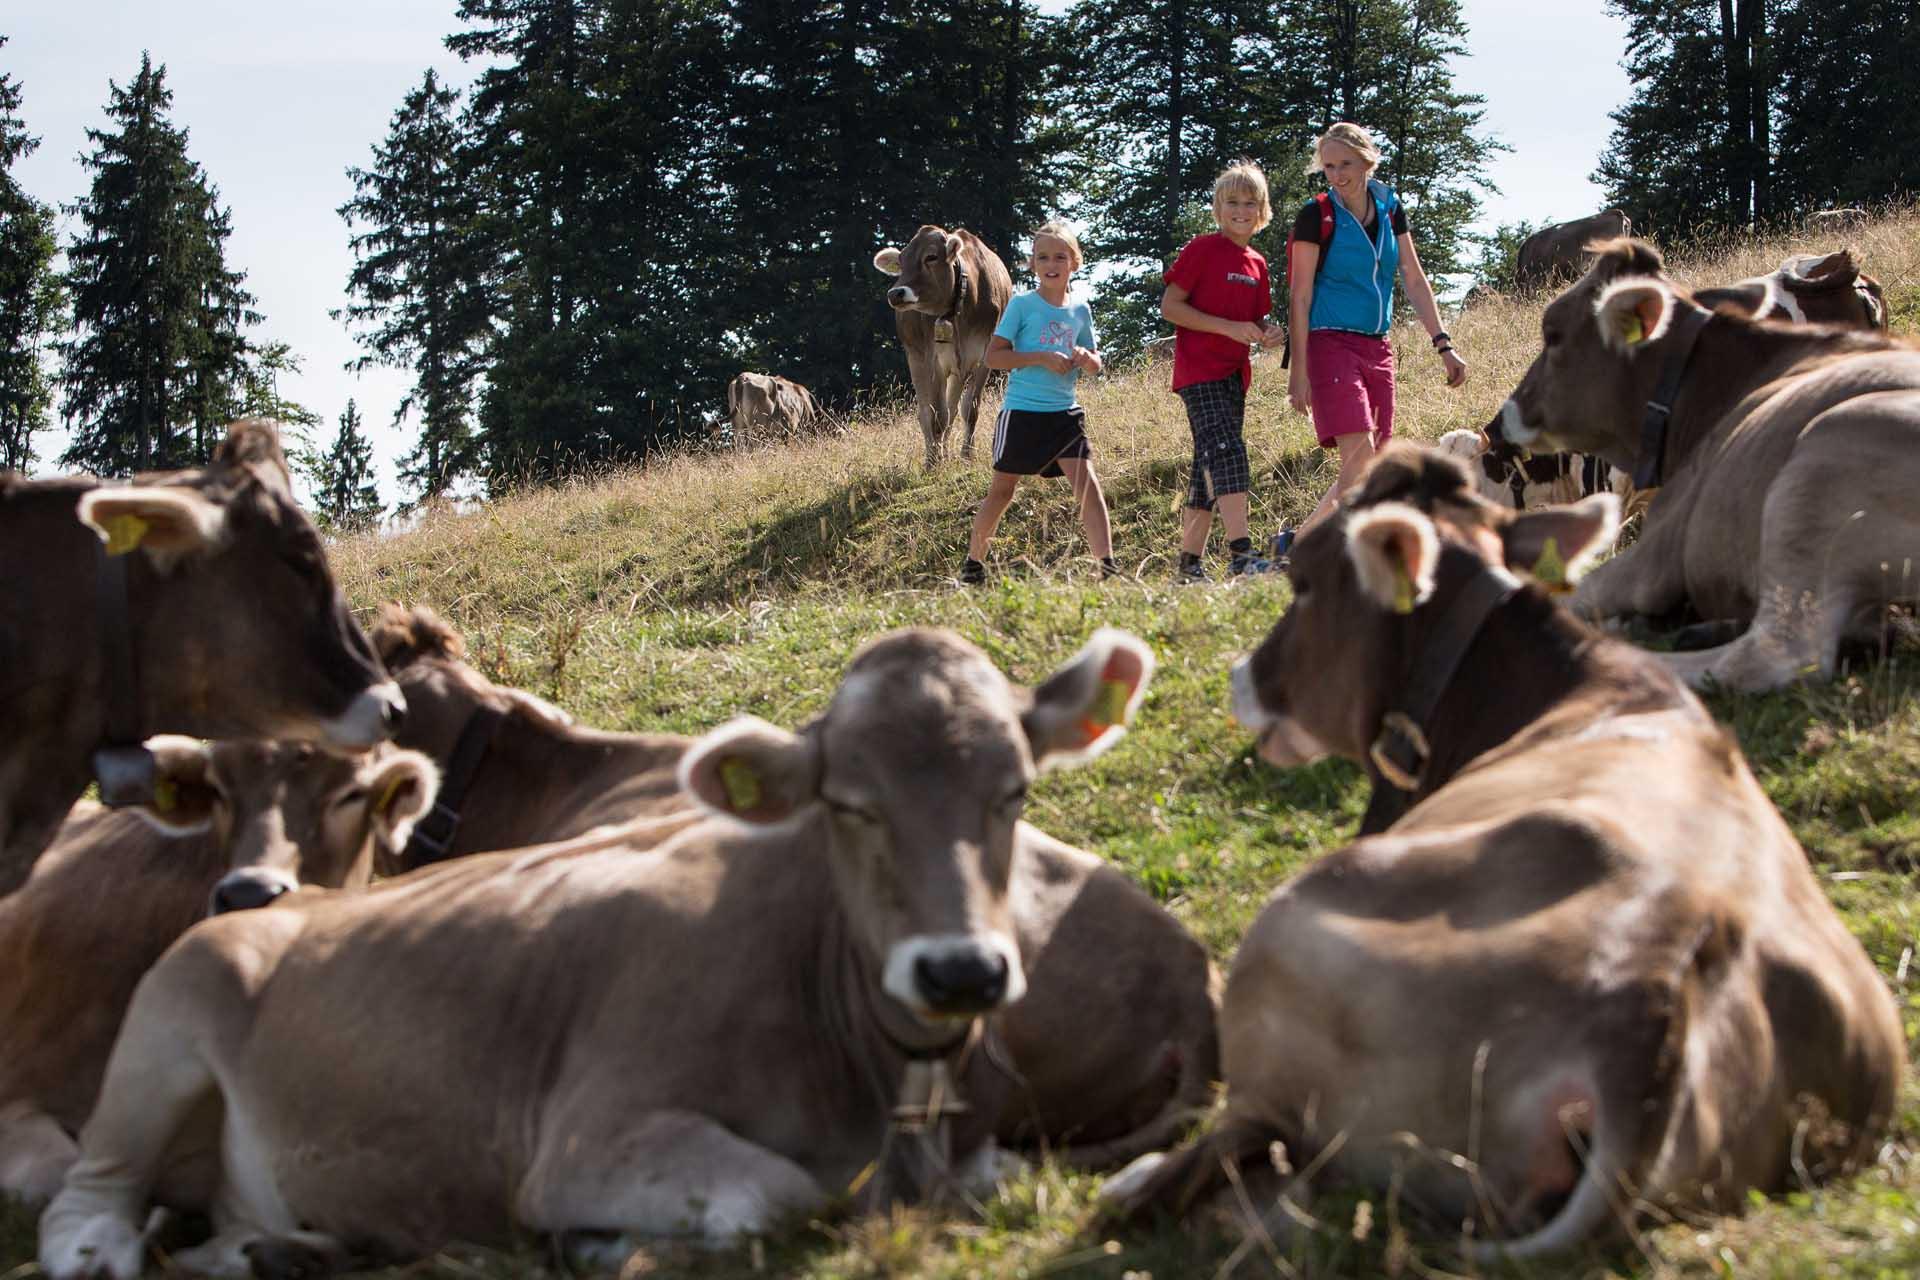 Familienwanderung in Isny, Kühe am Adelegg